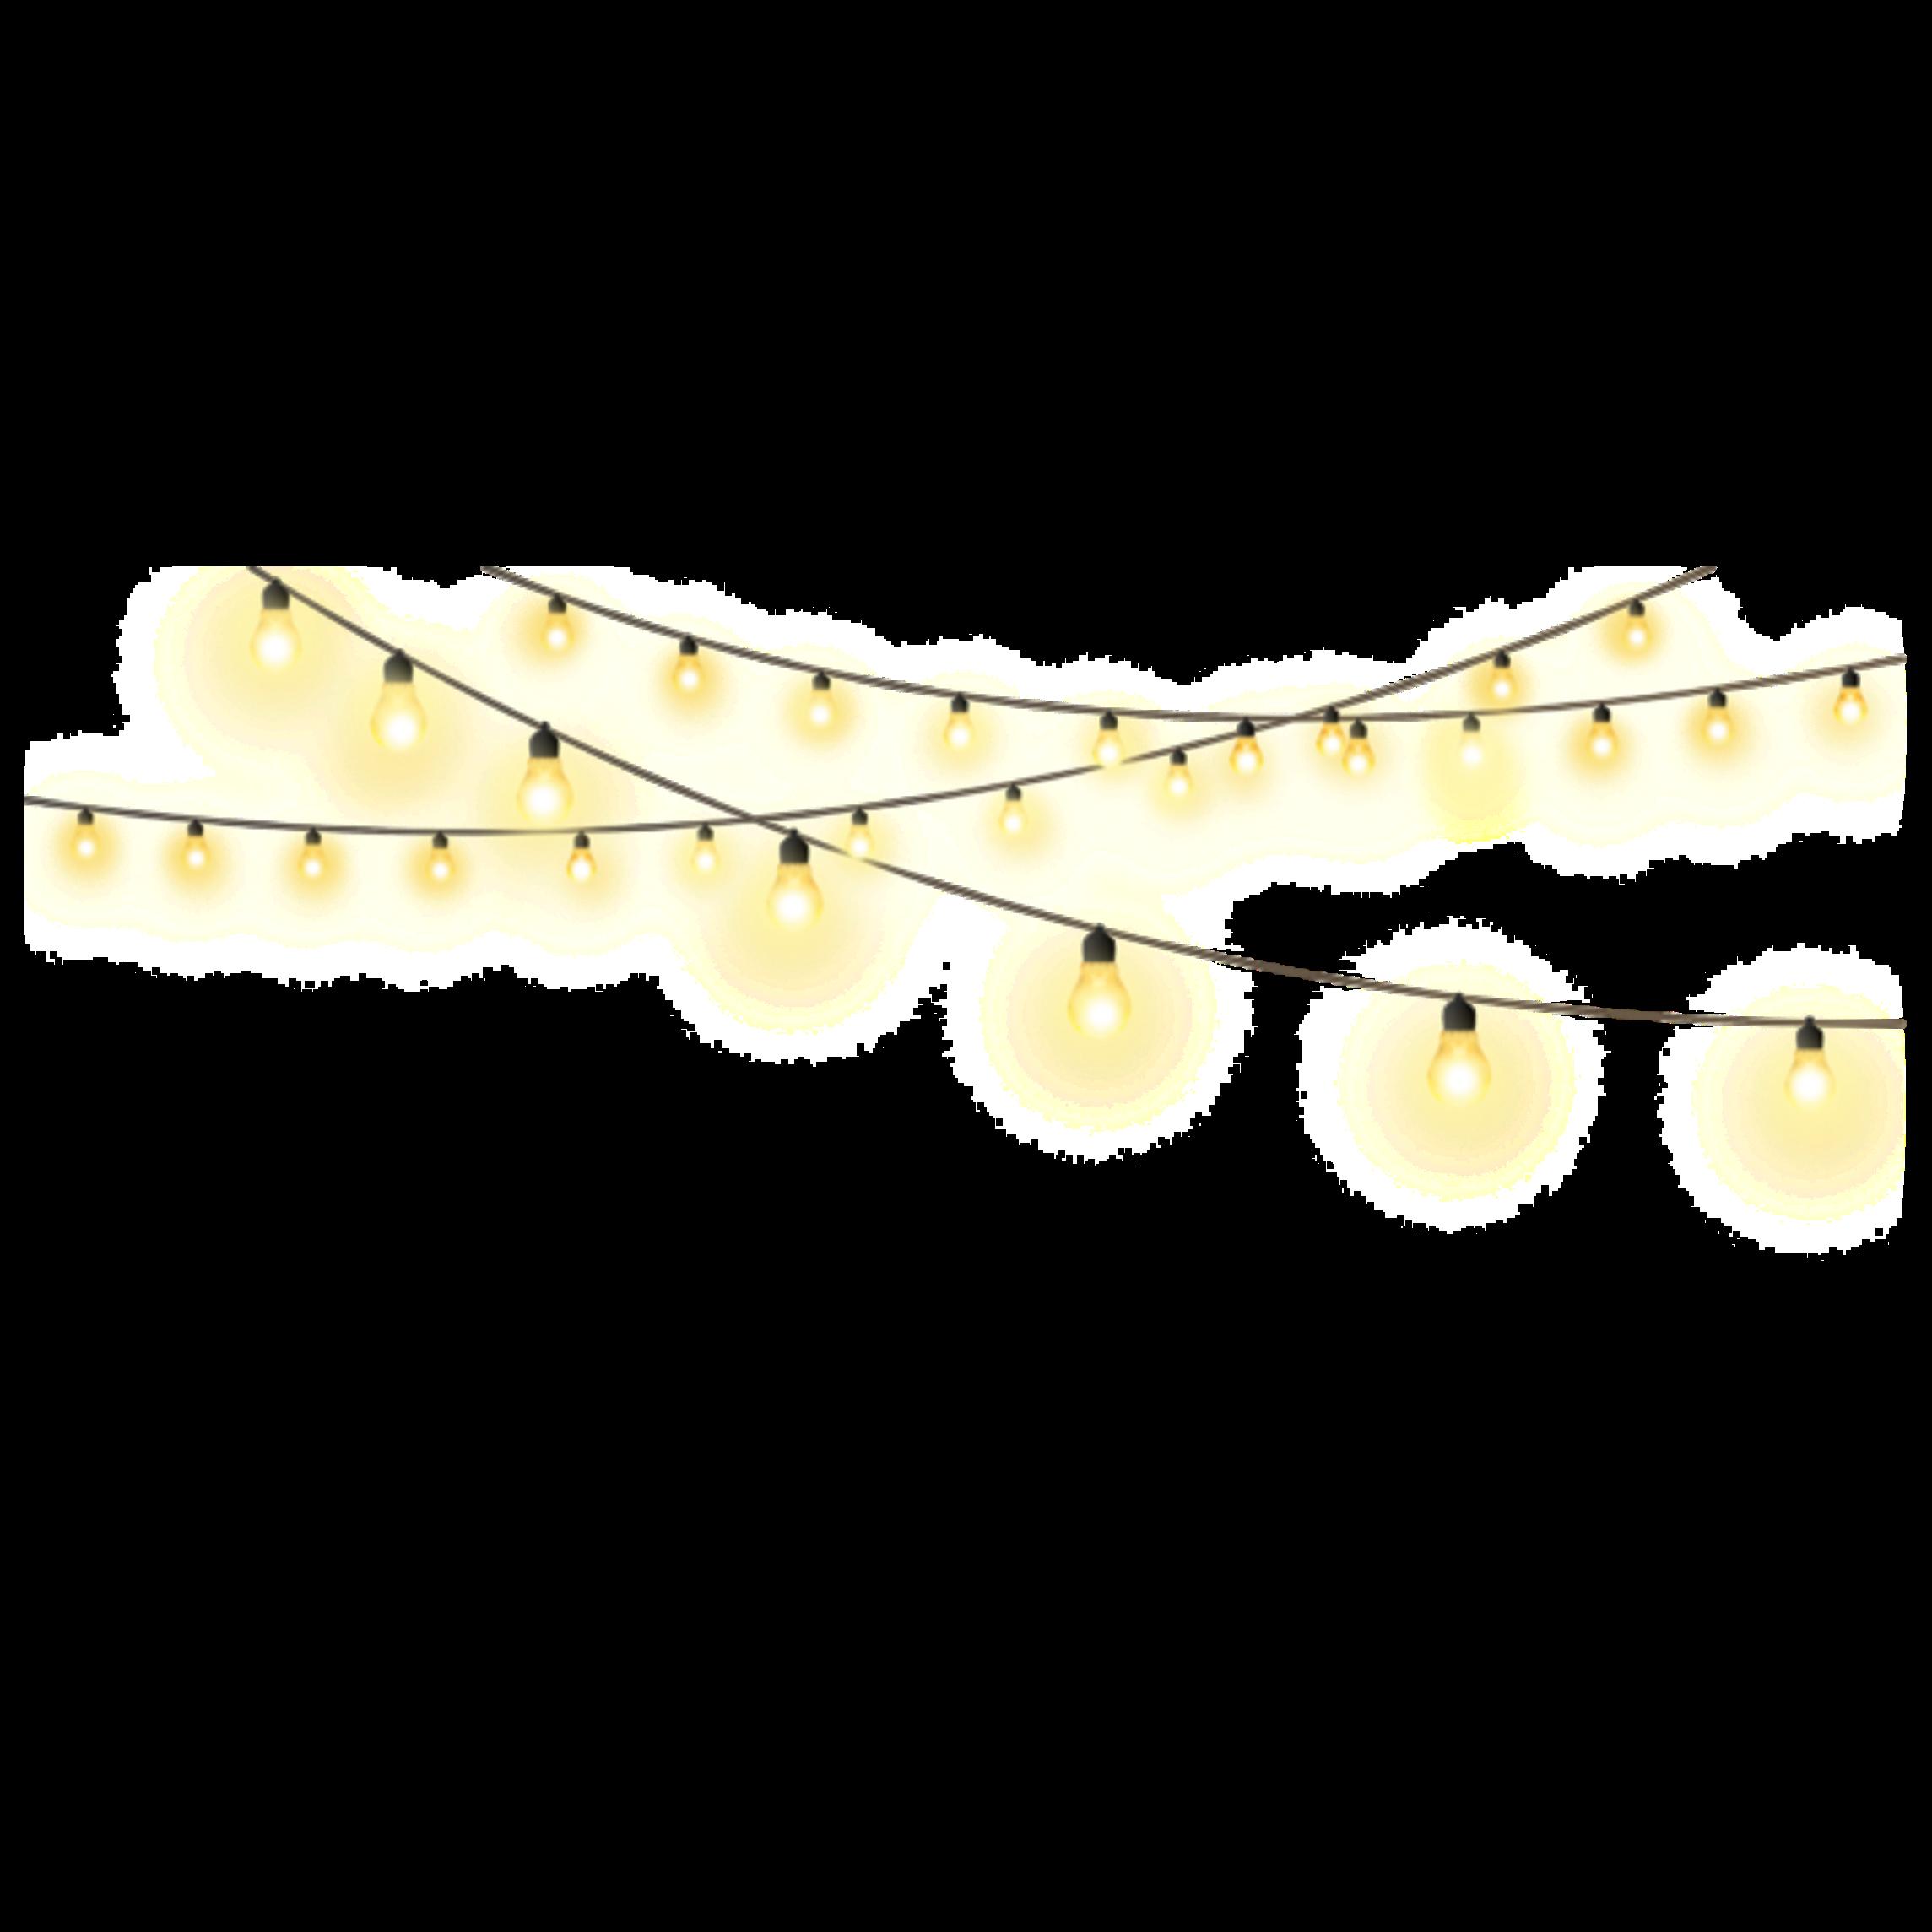 lights light tumblr asthetic honeycollage collage yello...